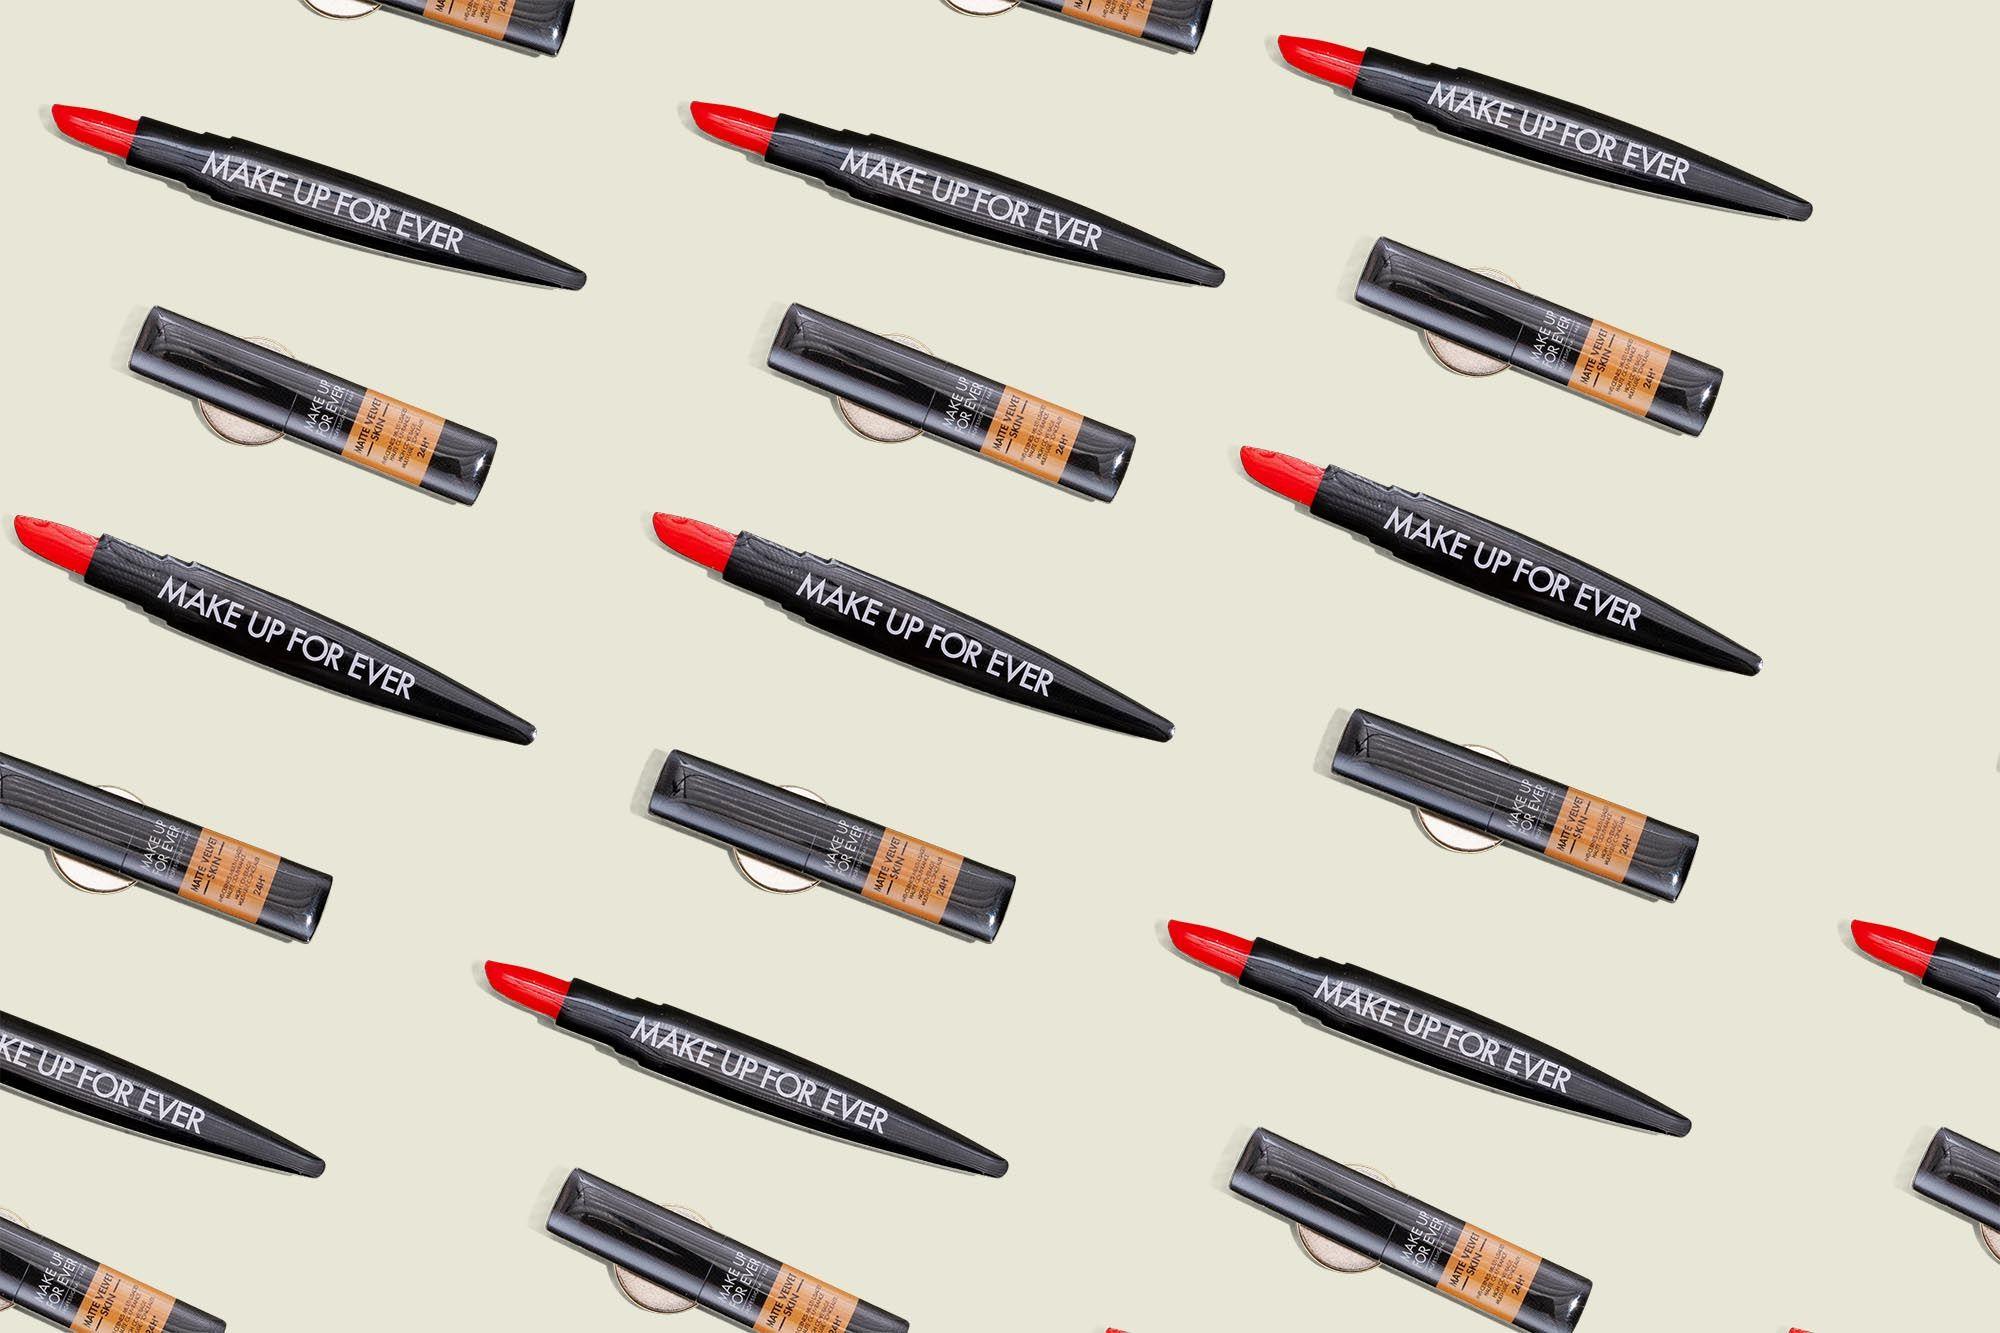 Magnet makeup accessories